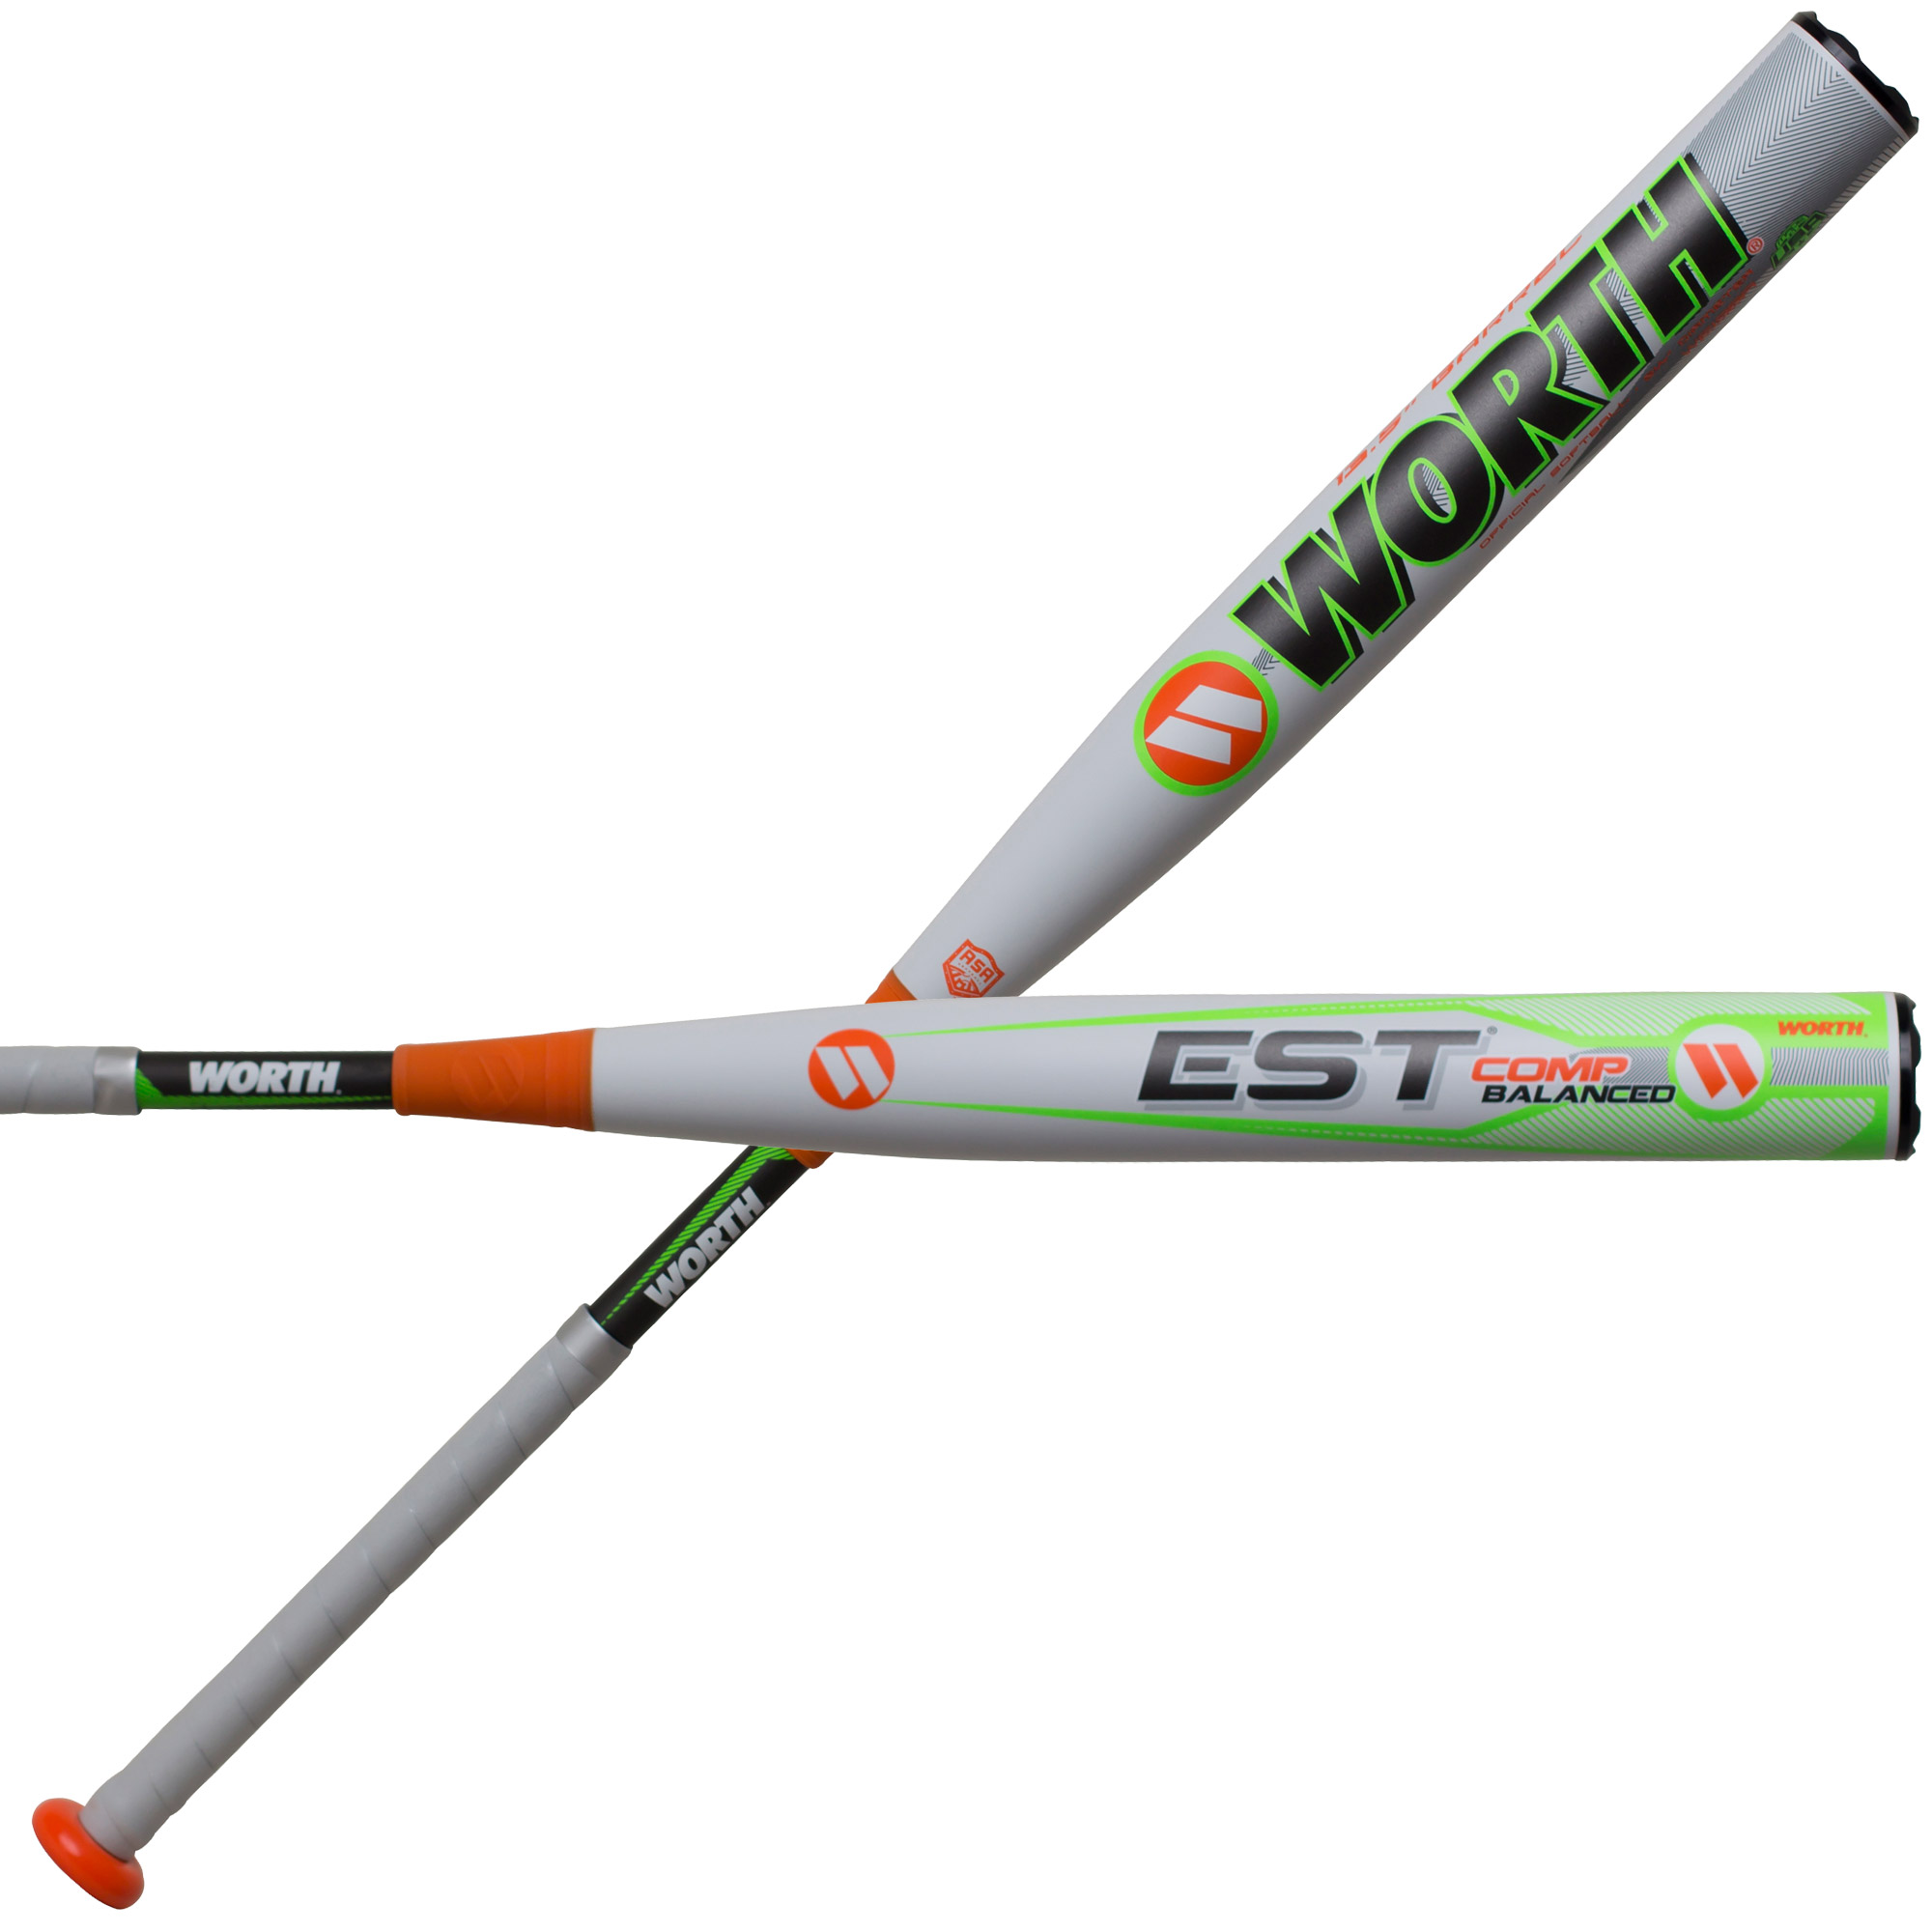 Worth EST COMP Balanced ASA WE19BA Slowpitch Softball Bat